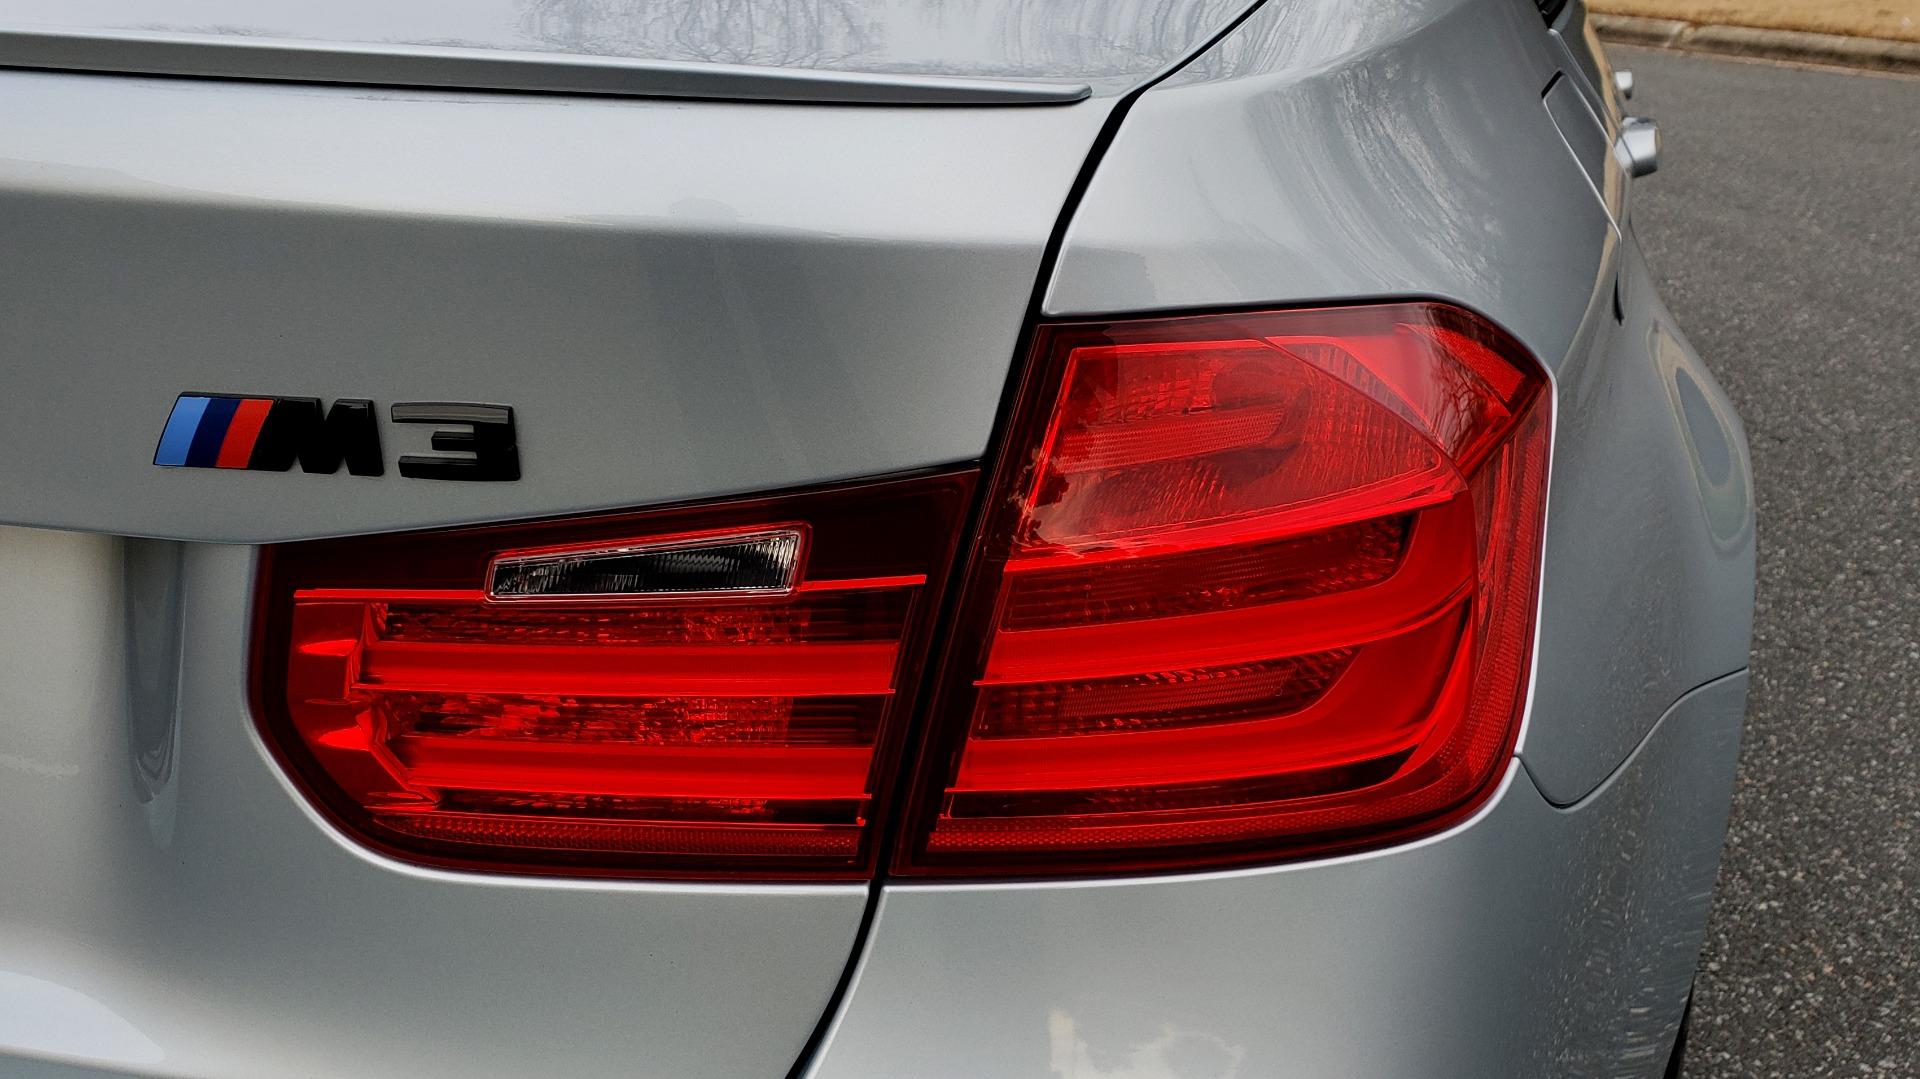 Used 2015 BMW M3 EXECUTIVE PKG / NAV / CAMERA / HUD / CARBON FIBER ROOF for sale Sold at Formula Imports in Charlotte NC 28227 34